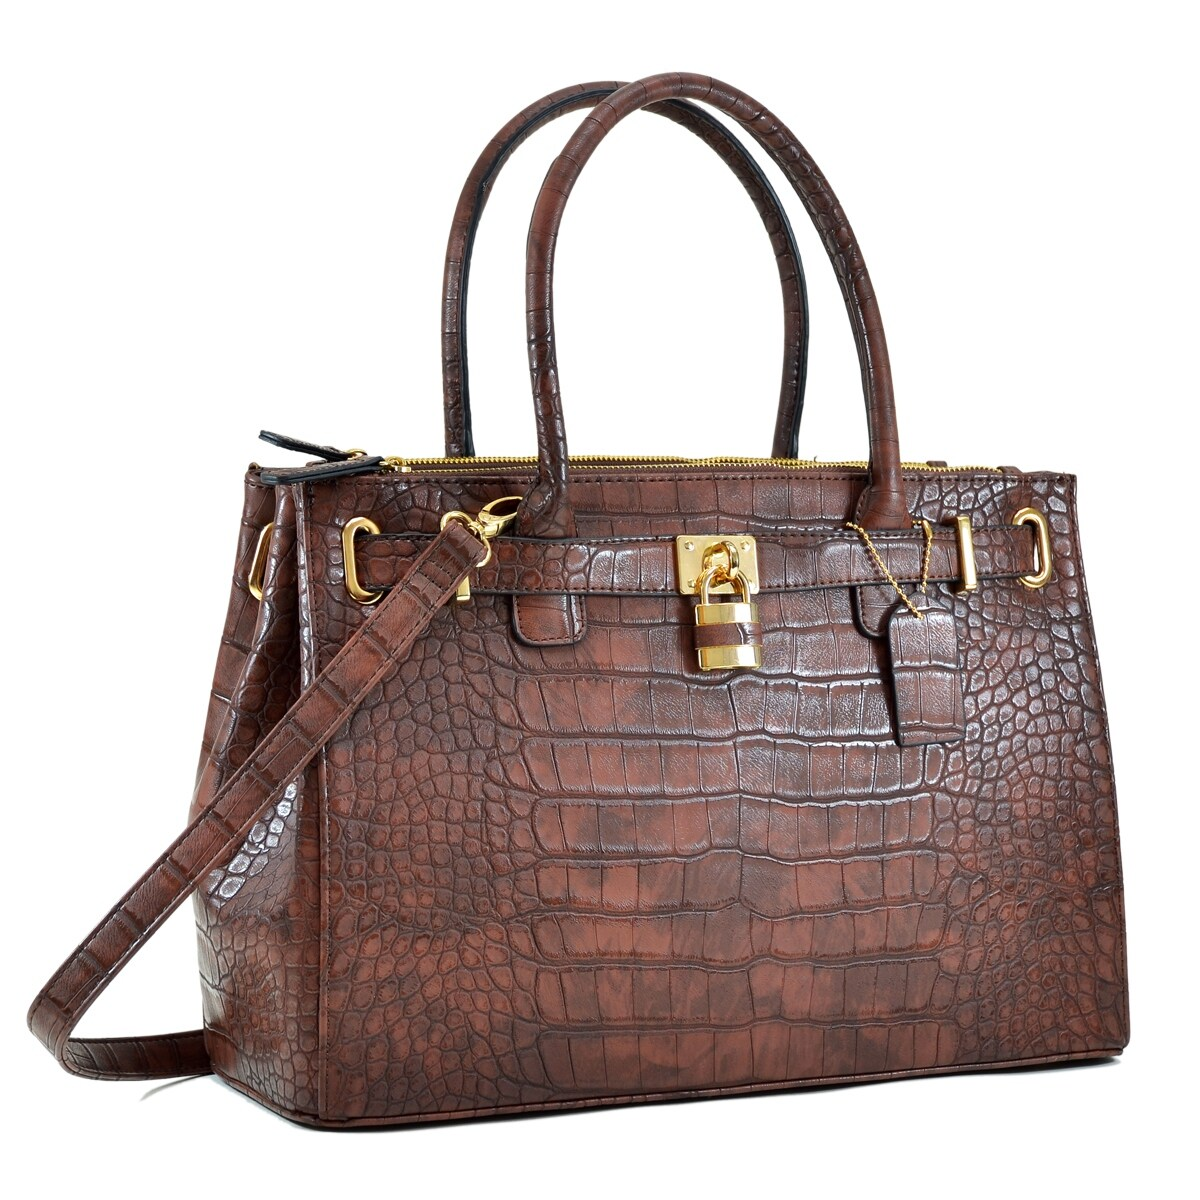 Details about  /PU Crocodile Embossed Elegant Womens Handbags Leather Satchel Tote CrossBody Bag